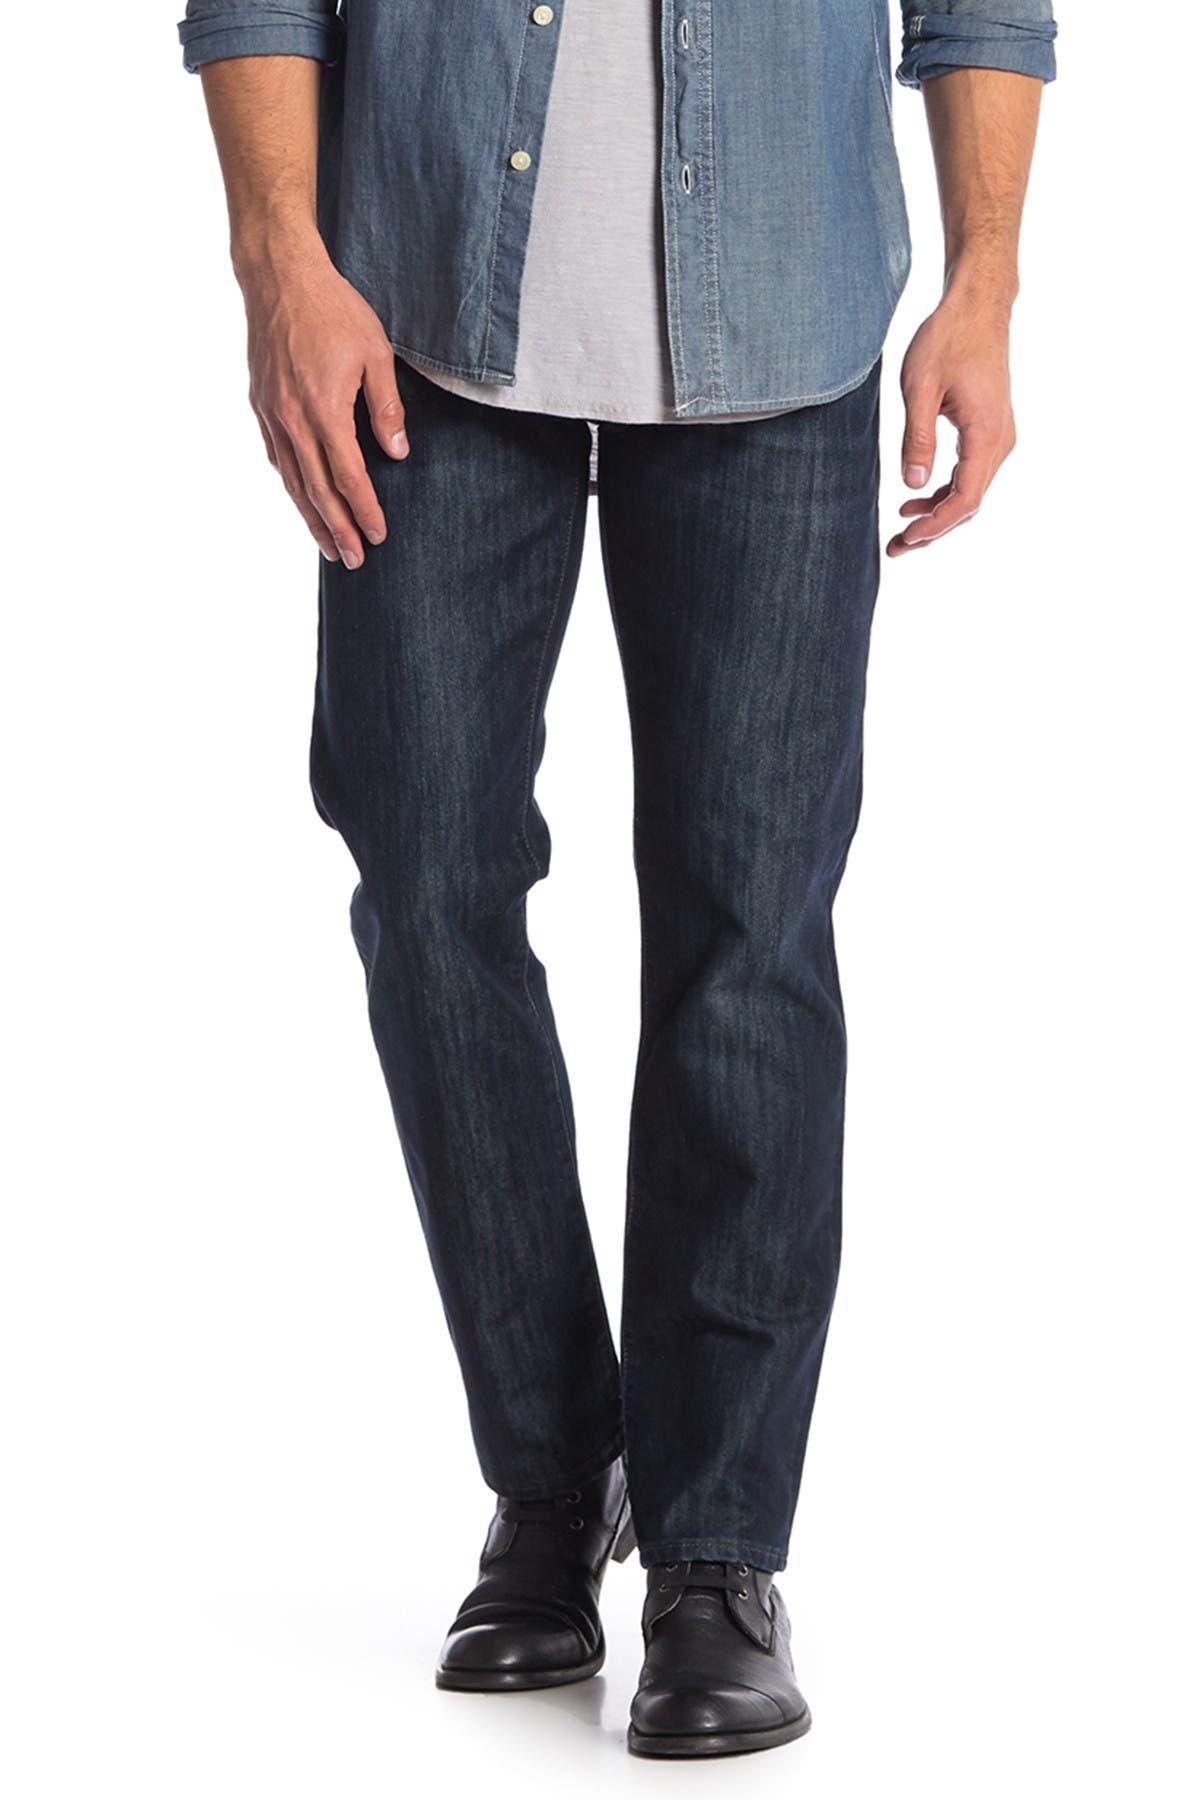 "Image of Mavi Zach Rinse Brushed Manhattan Straight Leg Jeans - 30-34"" Inseam"